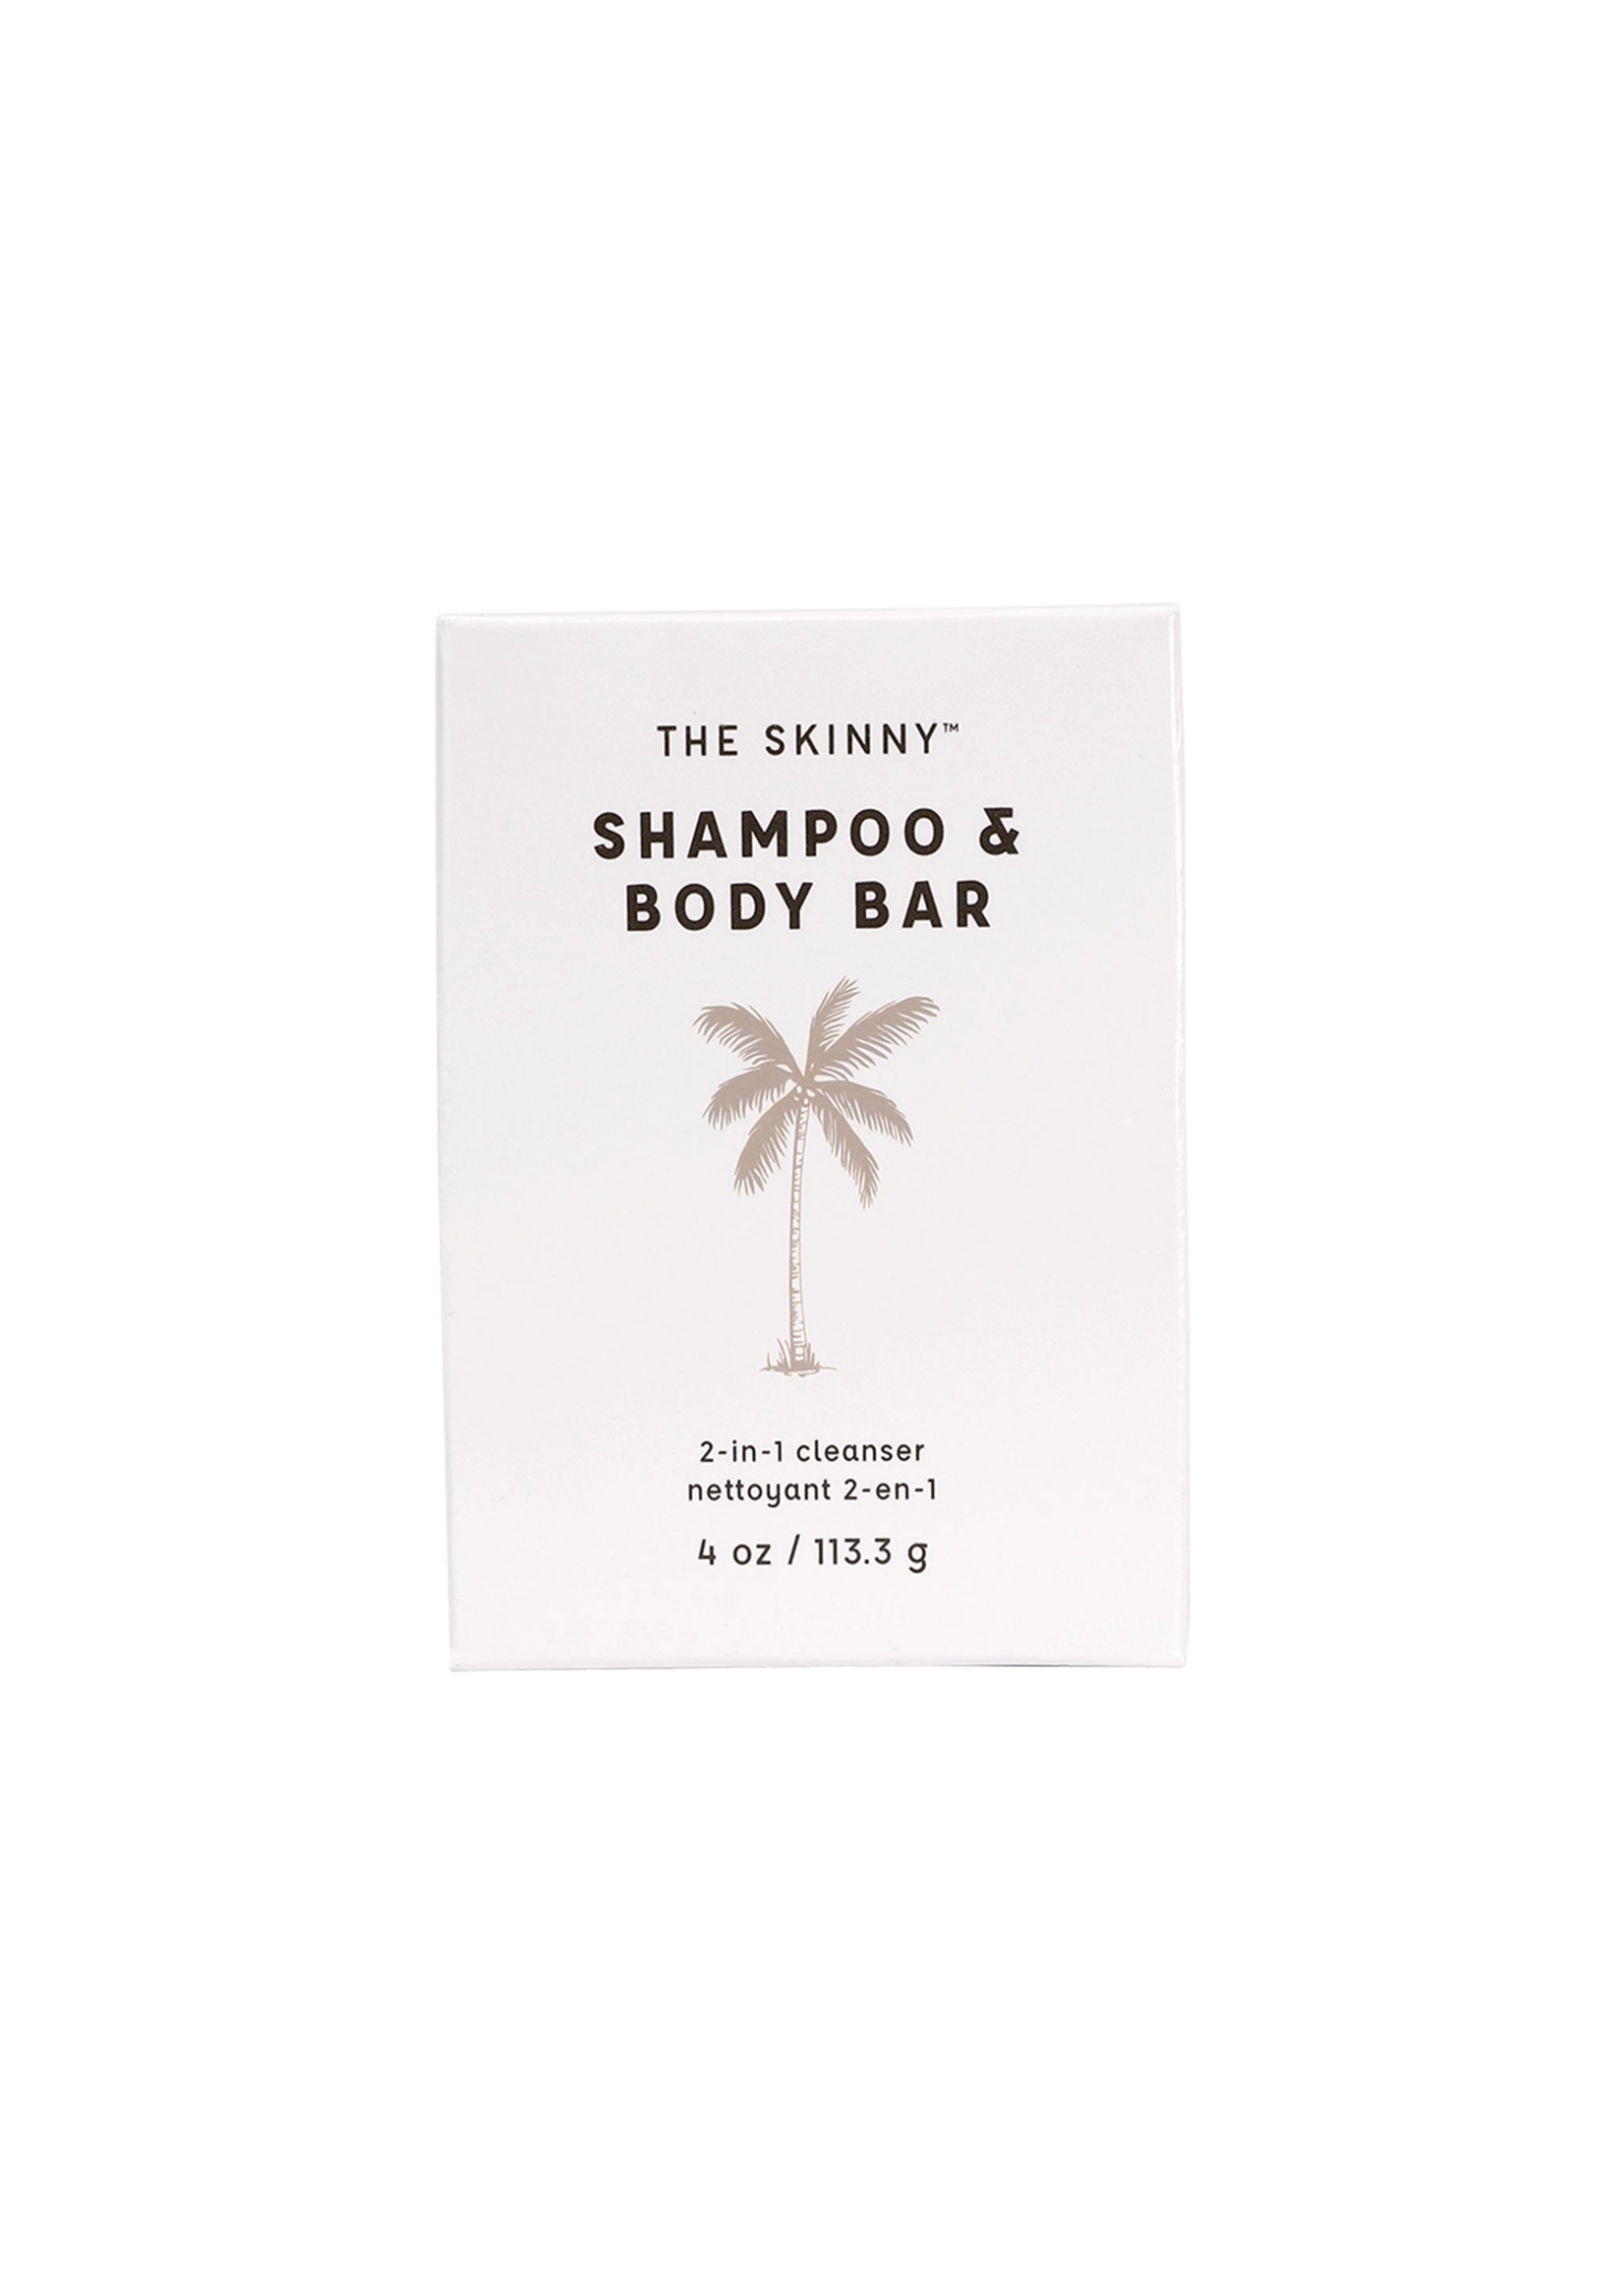 The Skinny Shampoo & Body Bar